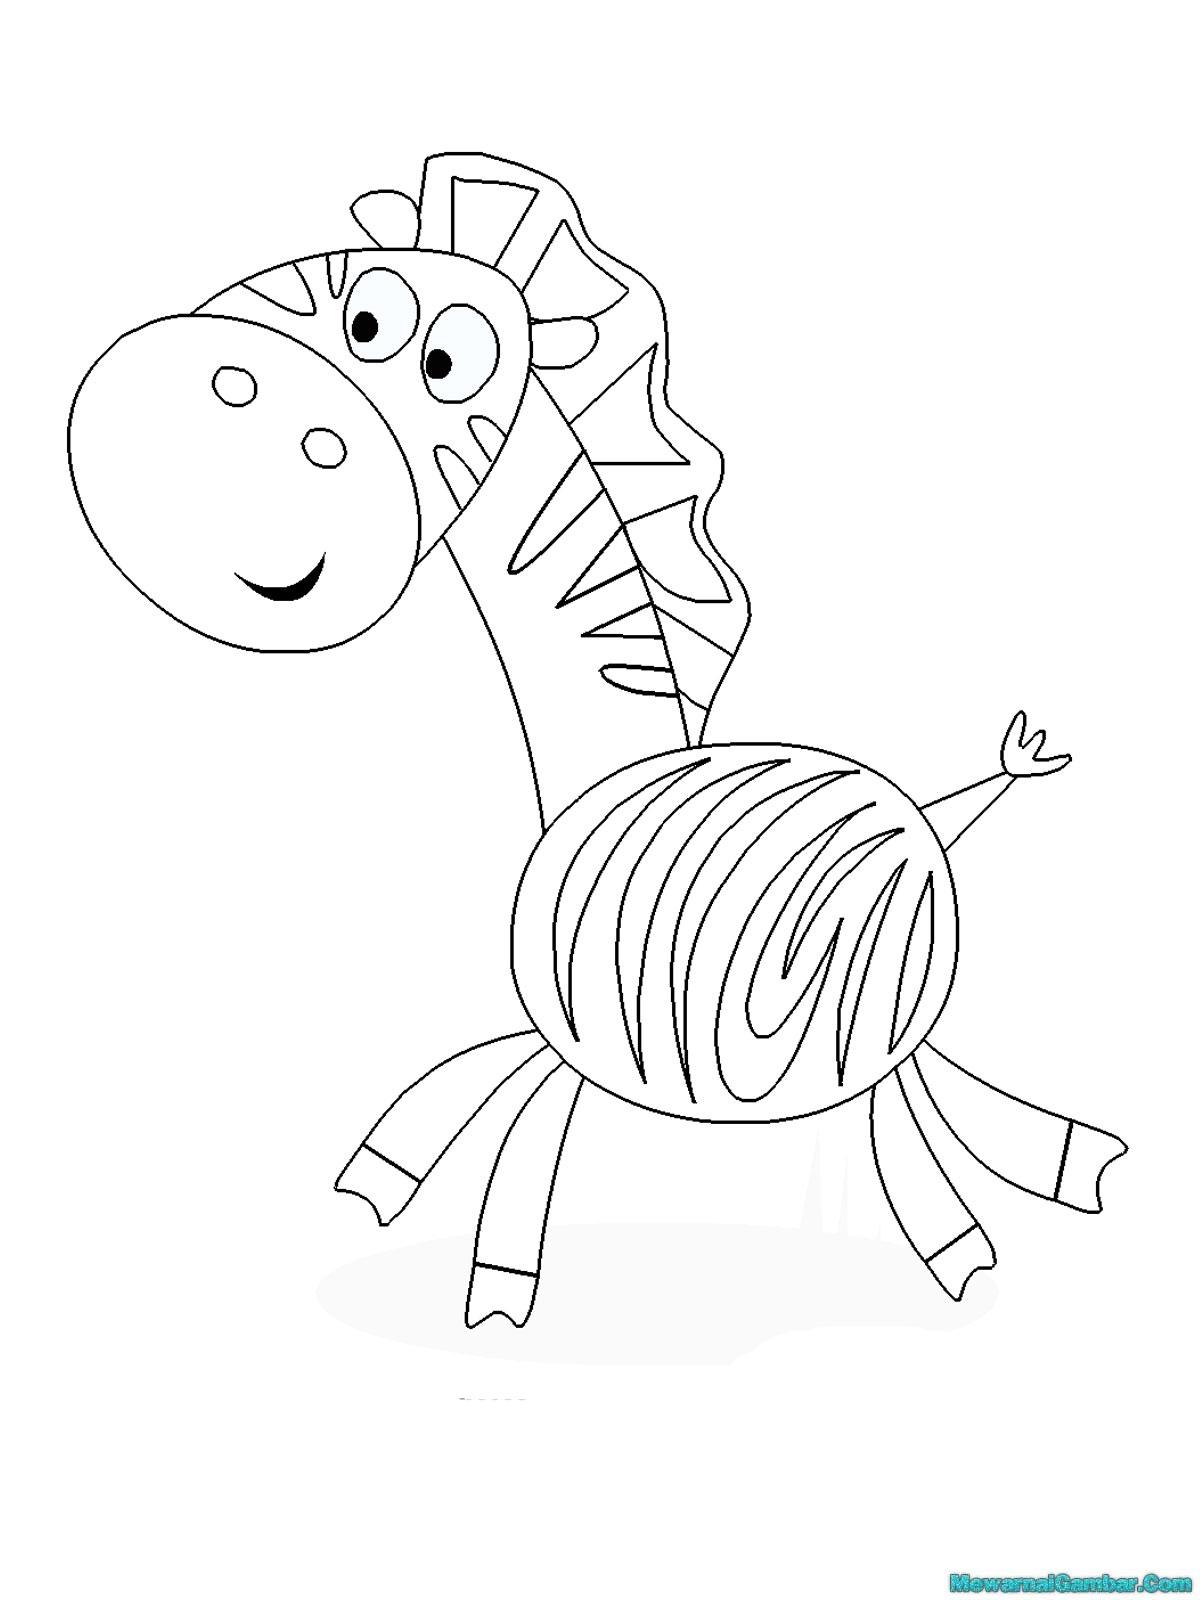 Buku Mewarnai 20 Gambar Zebra | Mewarnai Gambar